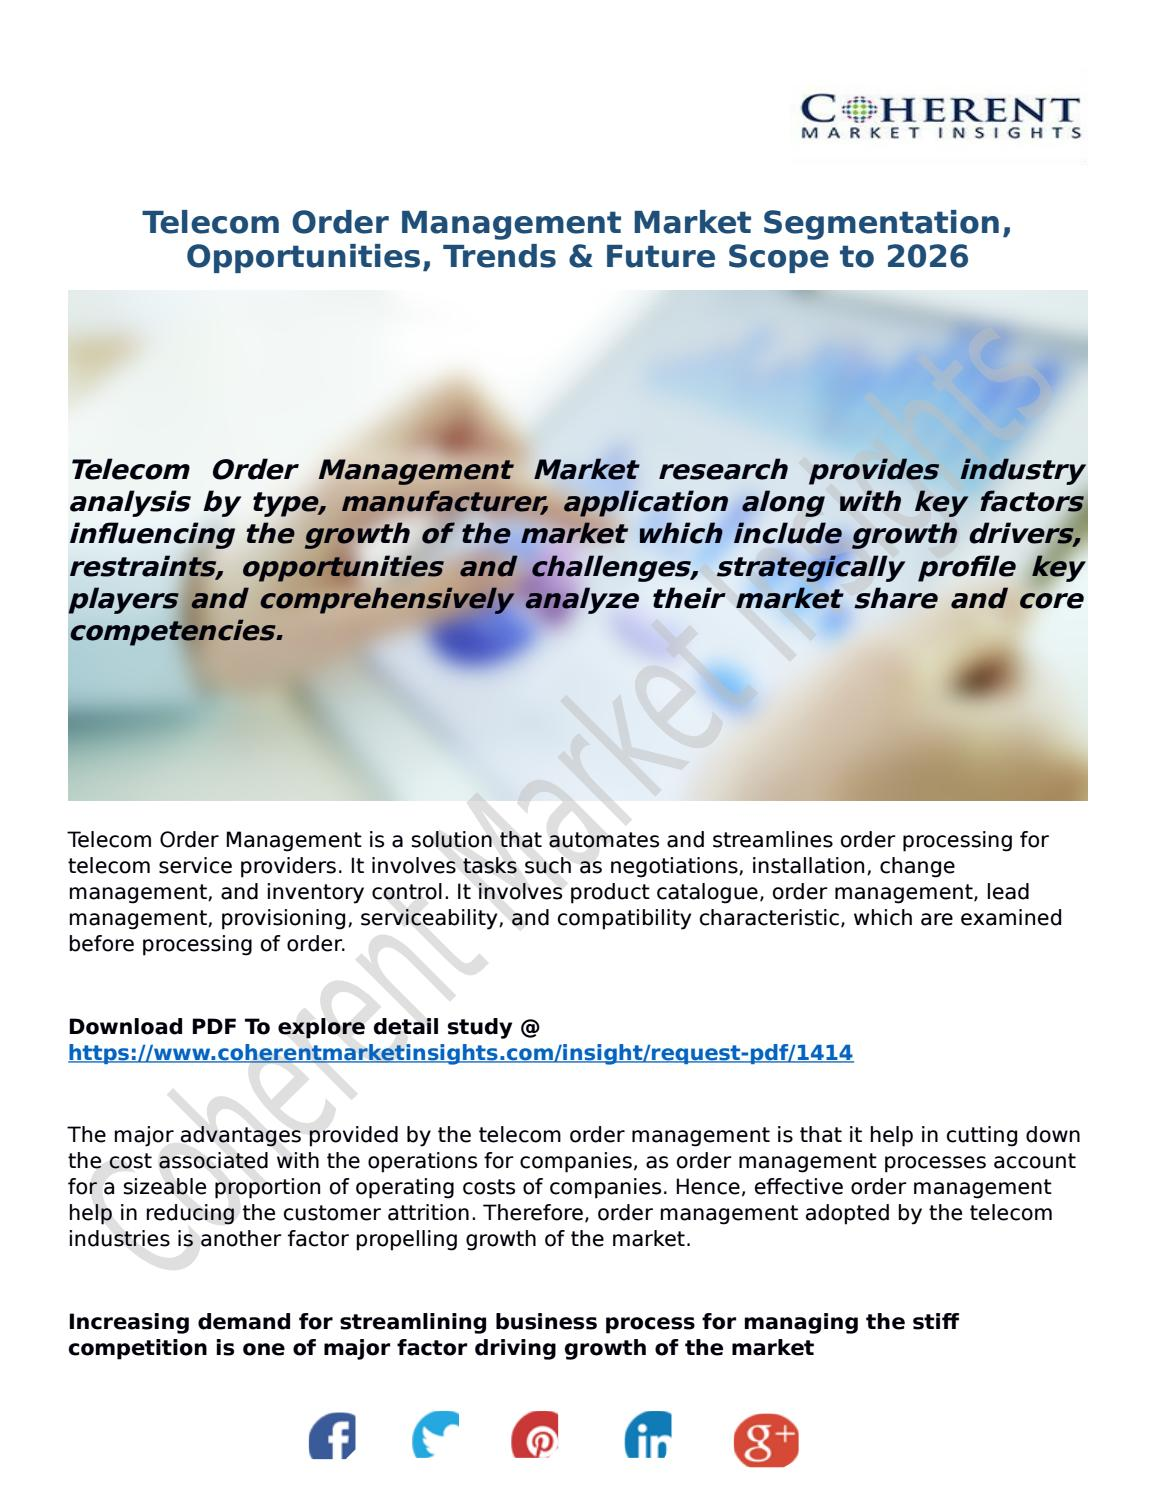 Telecom Order Management Market Segmentation, Opportunities